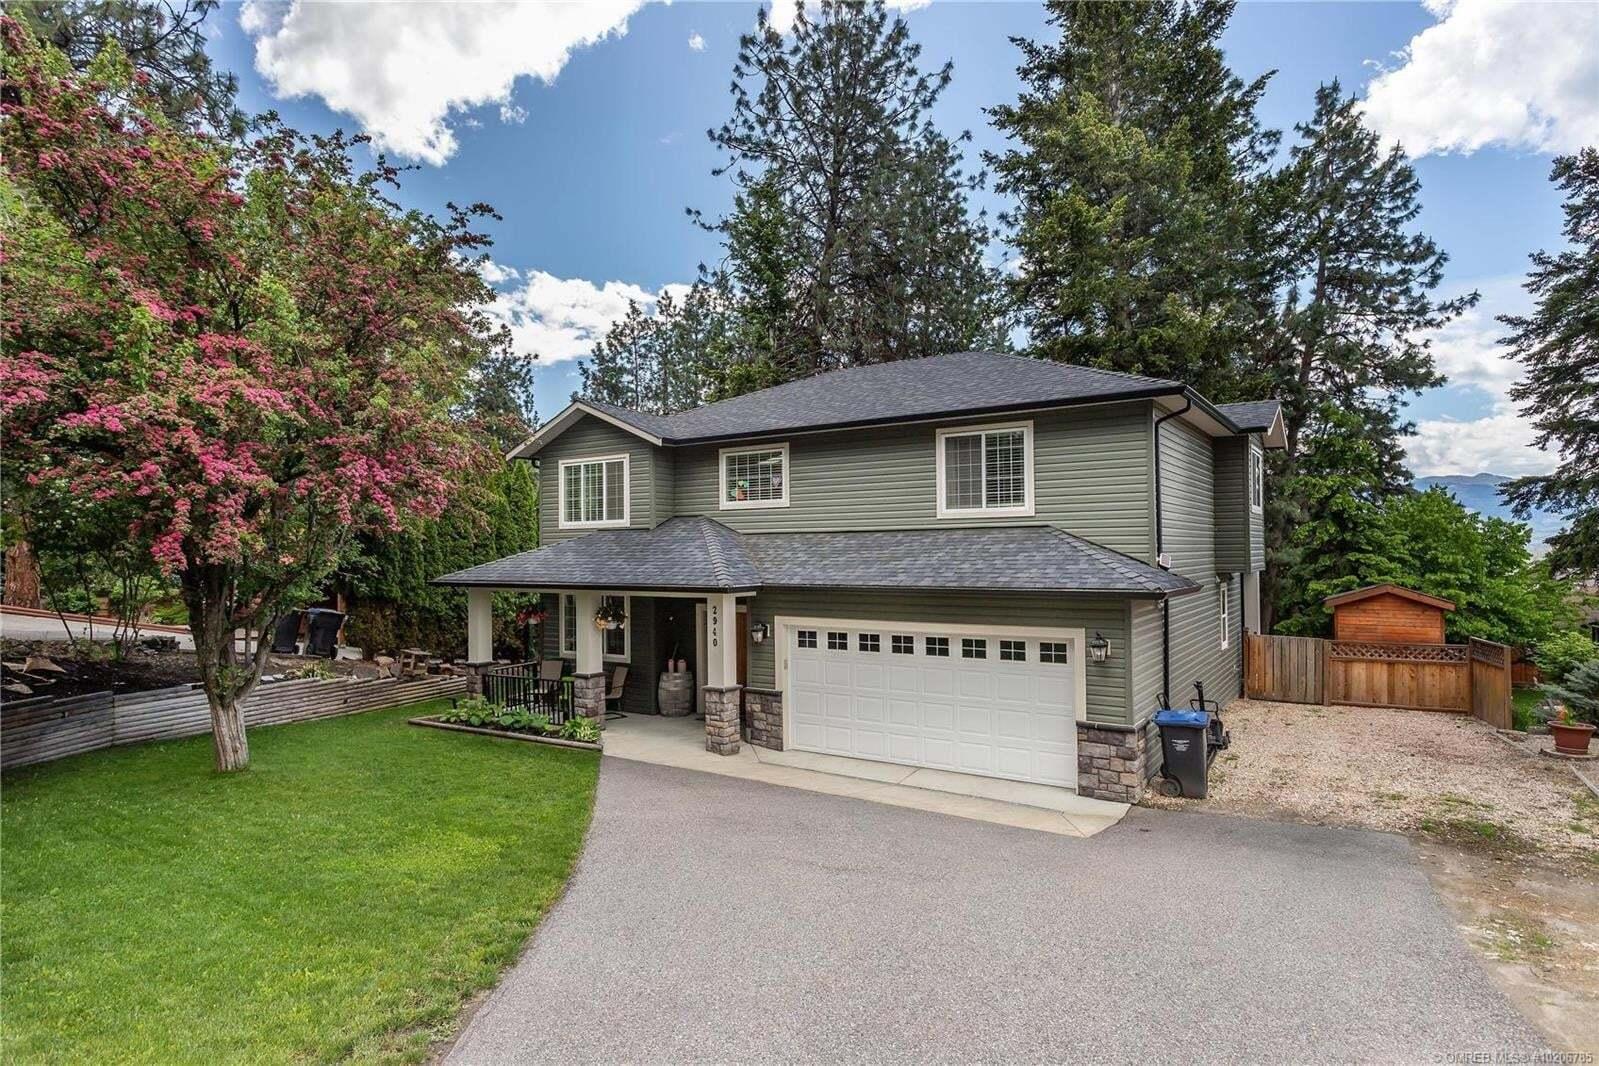 House for sale at 2940 Sandberg Rd West Kelowna British Columbia - MLS: 10206785